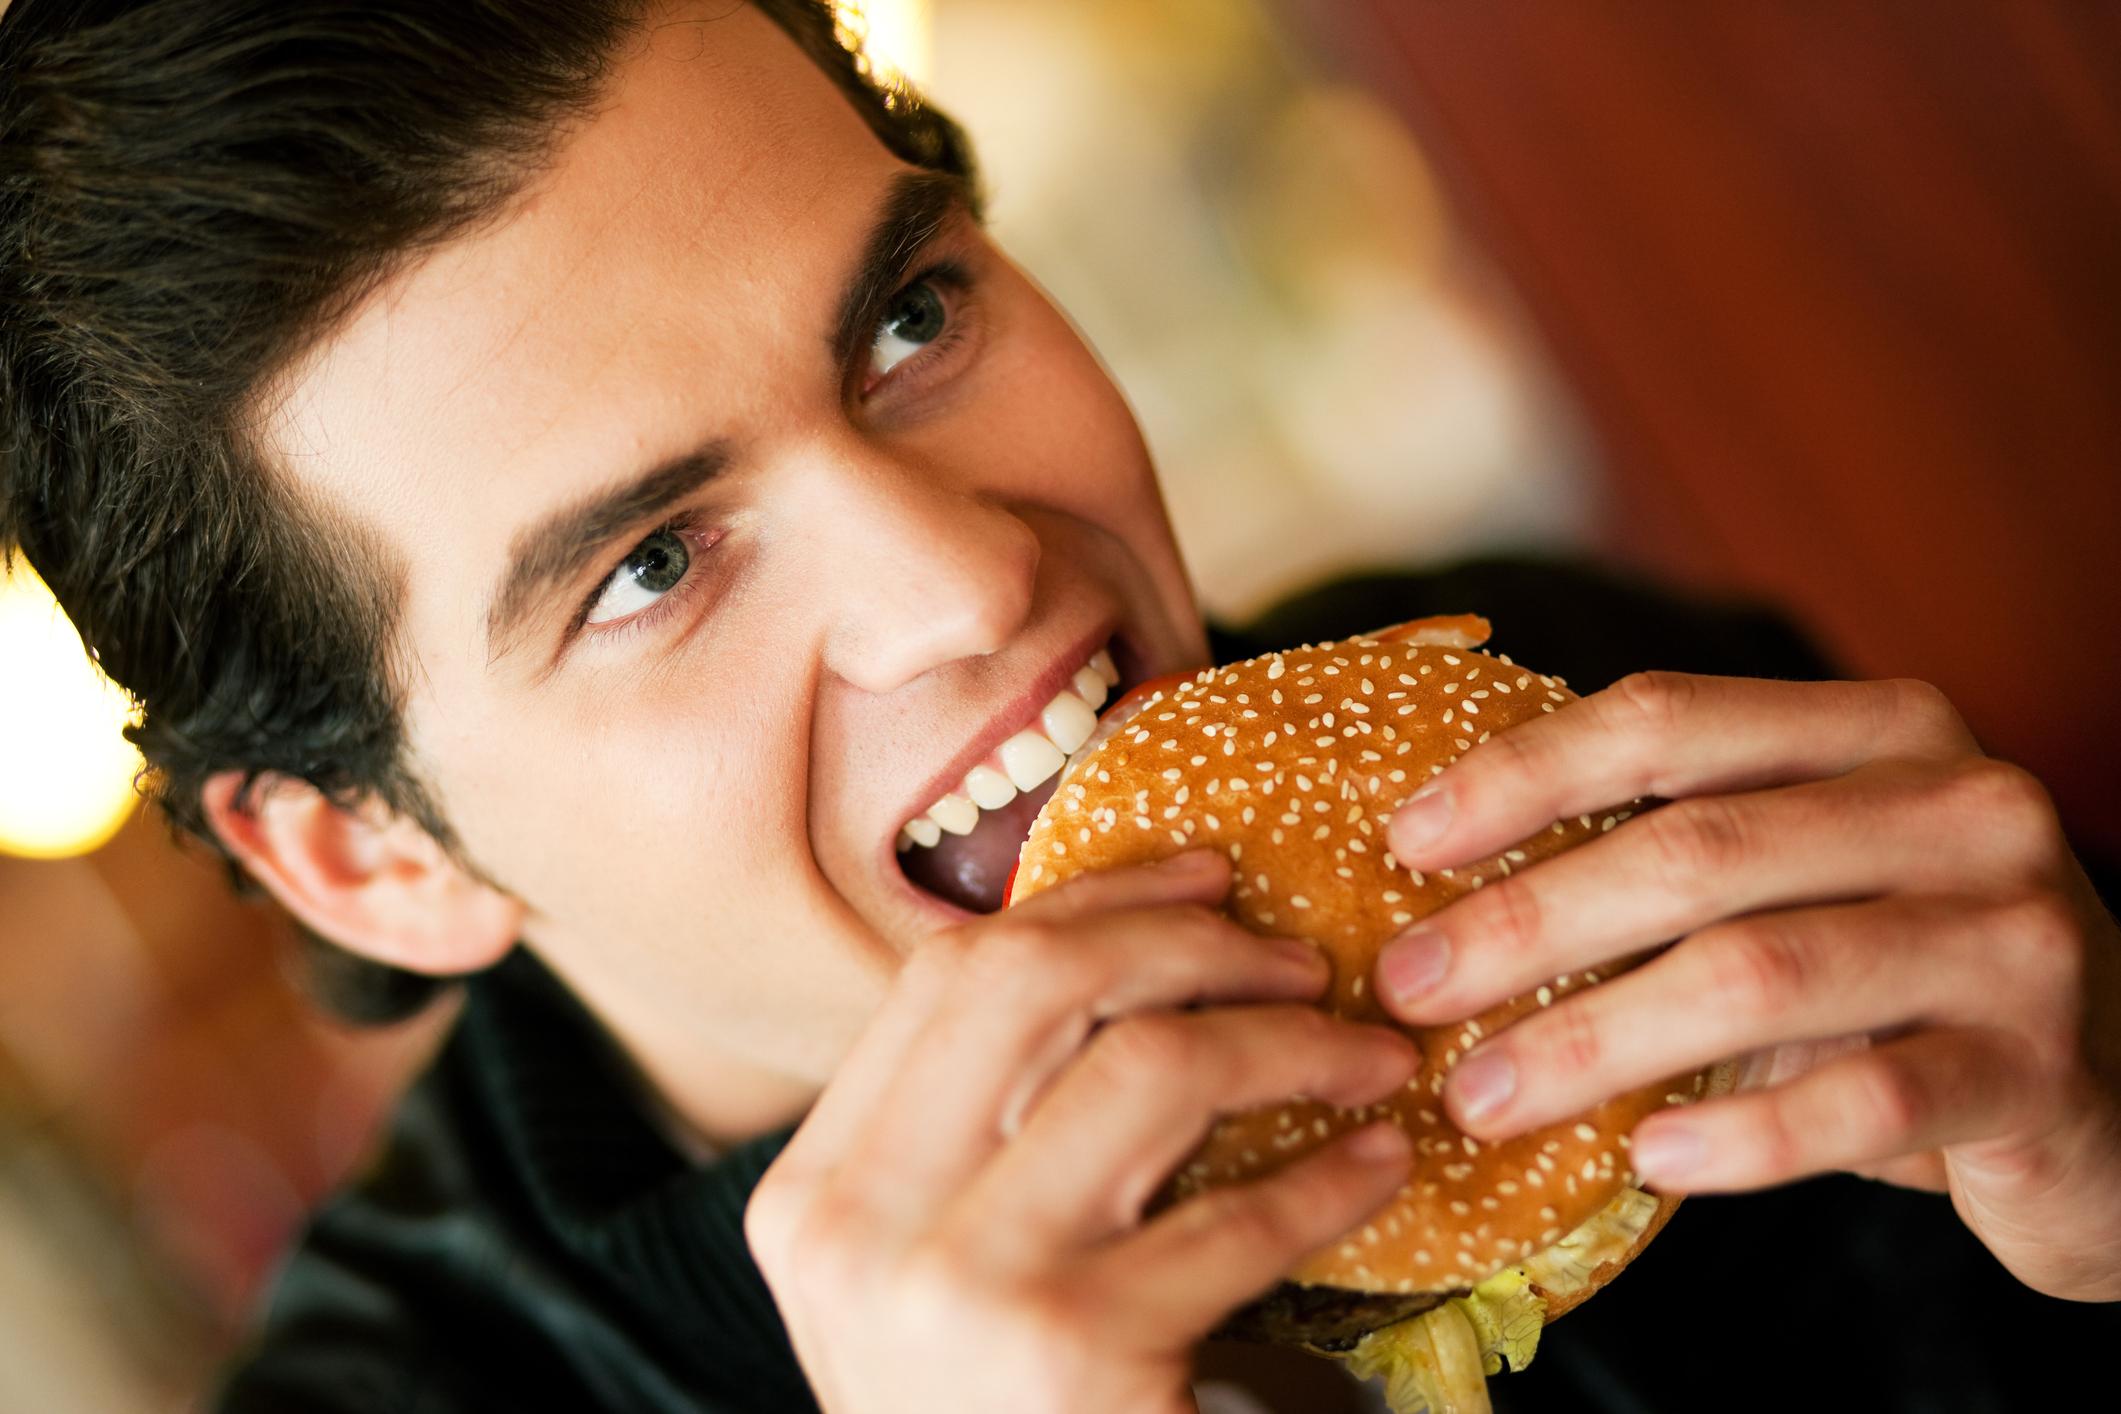 A man takes a bite out of a burger.